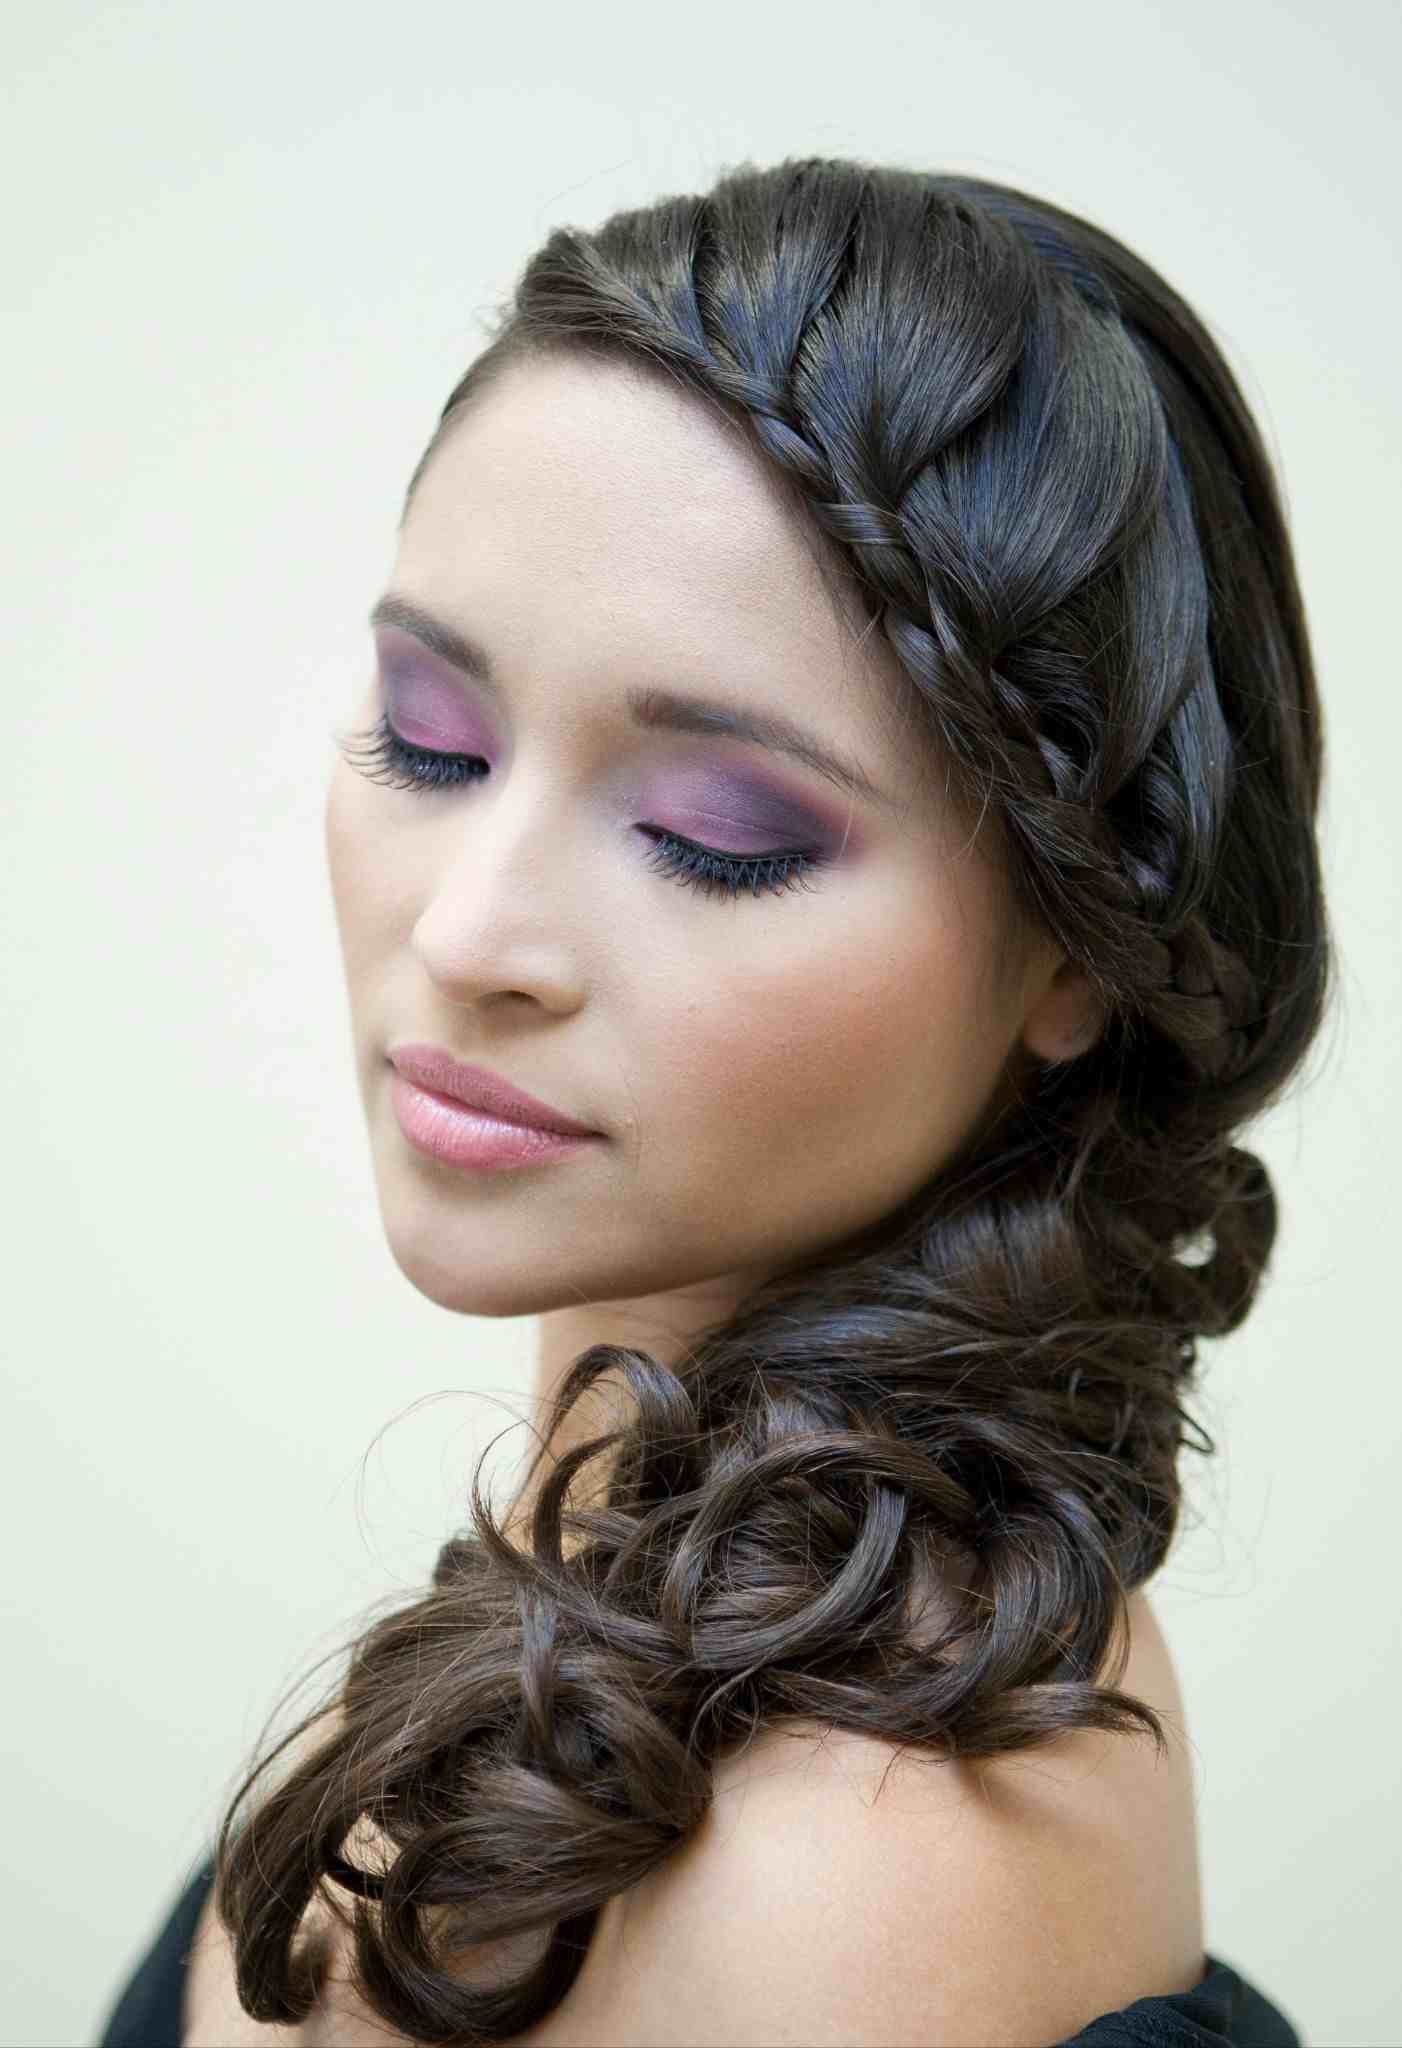 Top Houston Beauty Salons Beauty Salons In Houston Tx My Houston